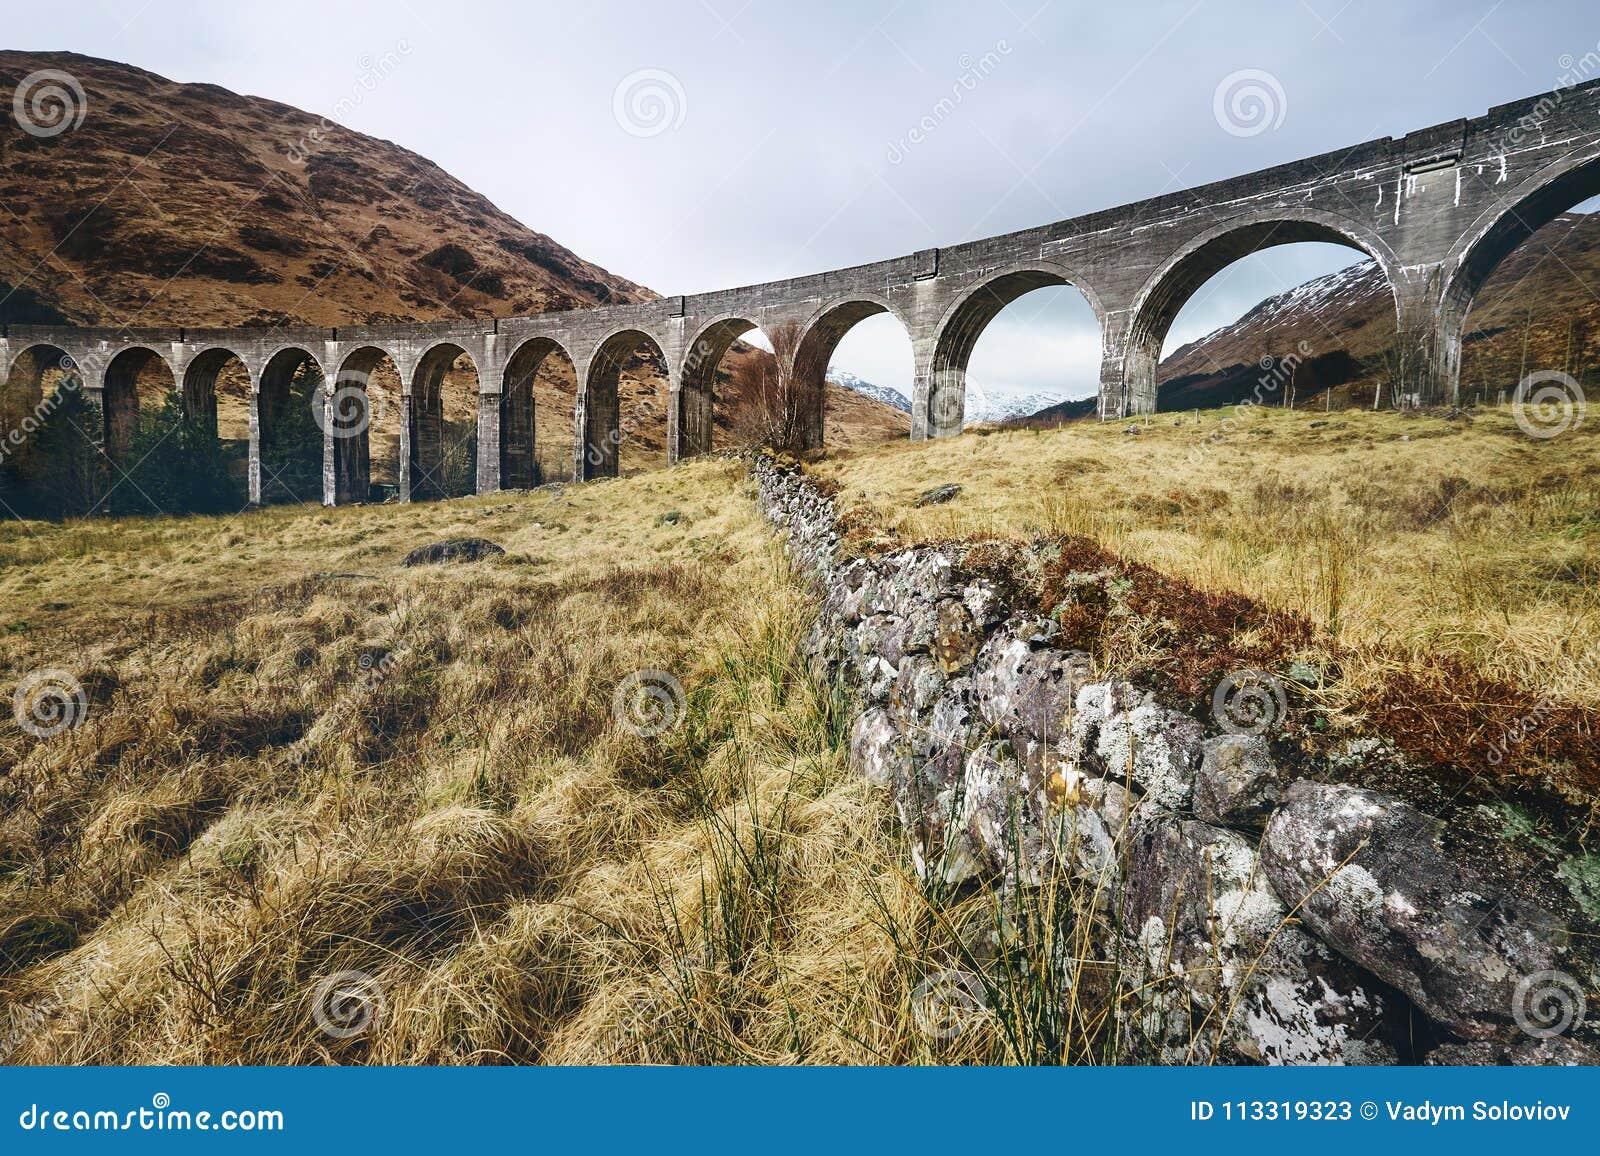 Viaduto famoso de Glenfinnan, montanhas, Escócia, Reino Unido